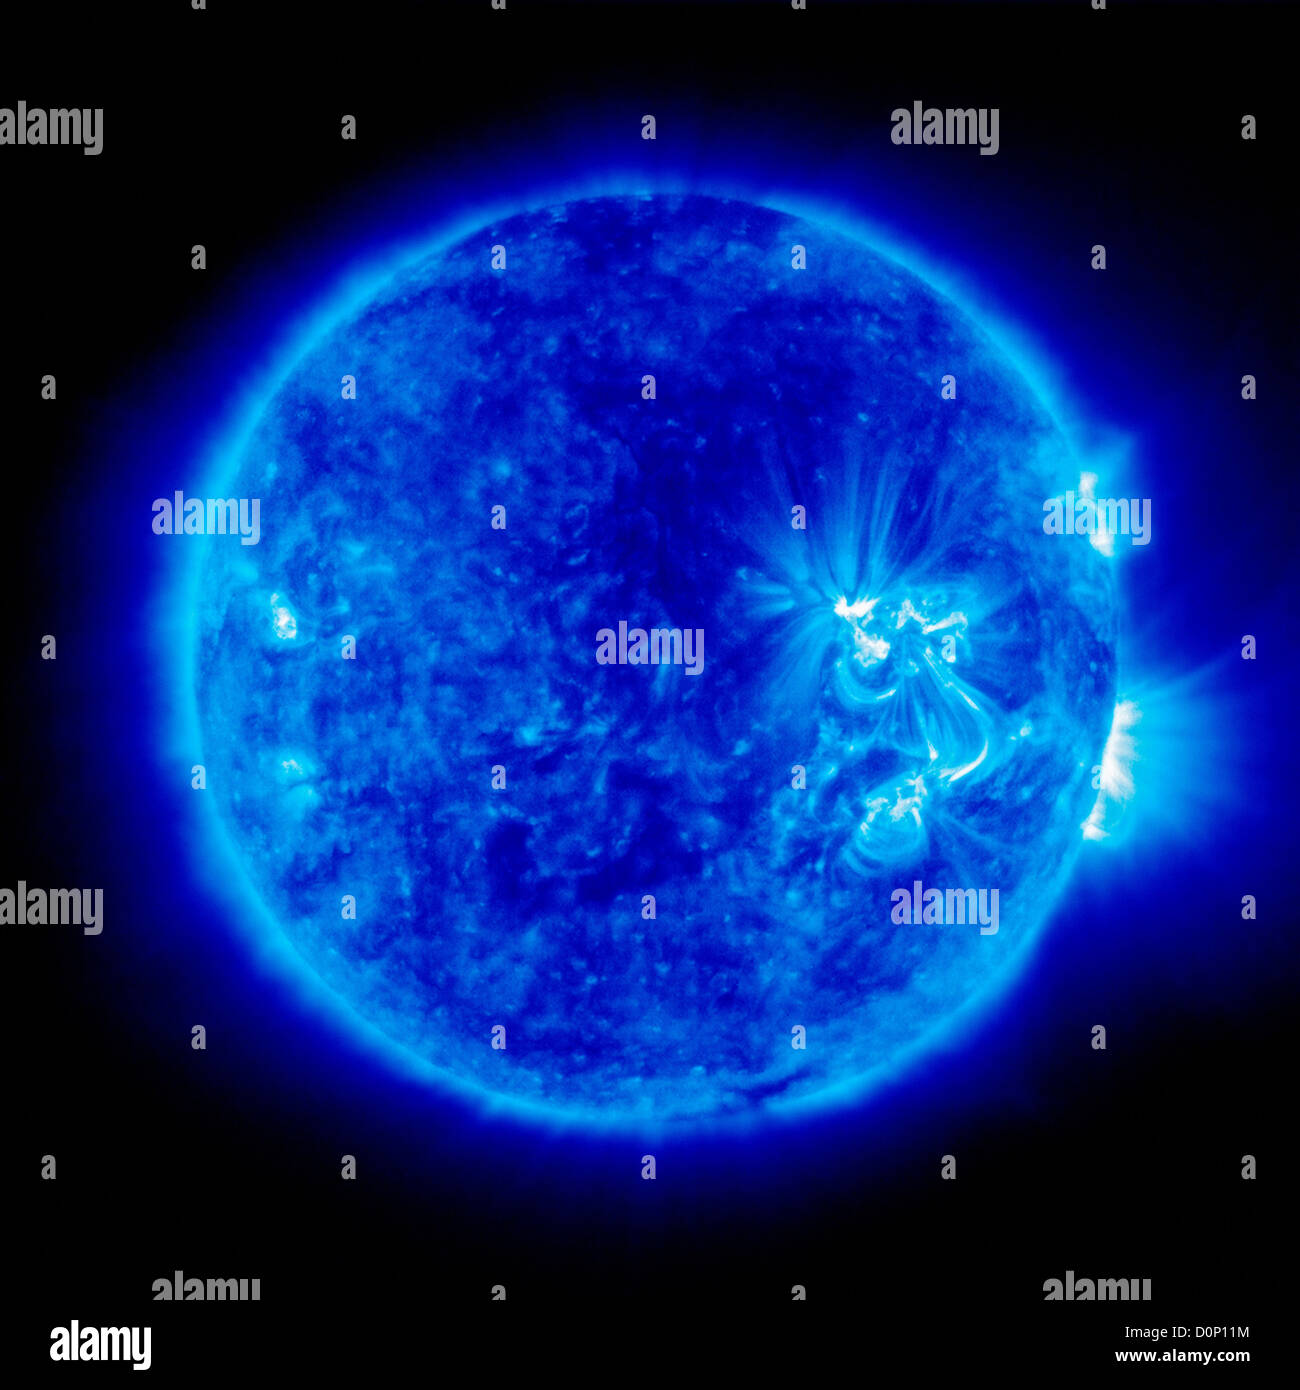 An image Sun taken Extreme ultraviolet Imaging Telescope (EIT) Solar Heliospheric Observatory (SOHO) 171 angstroms - Stock Image